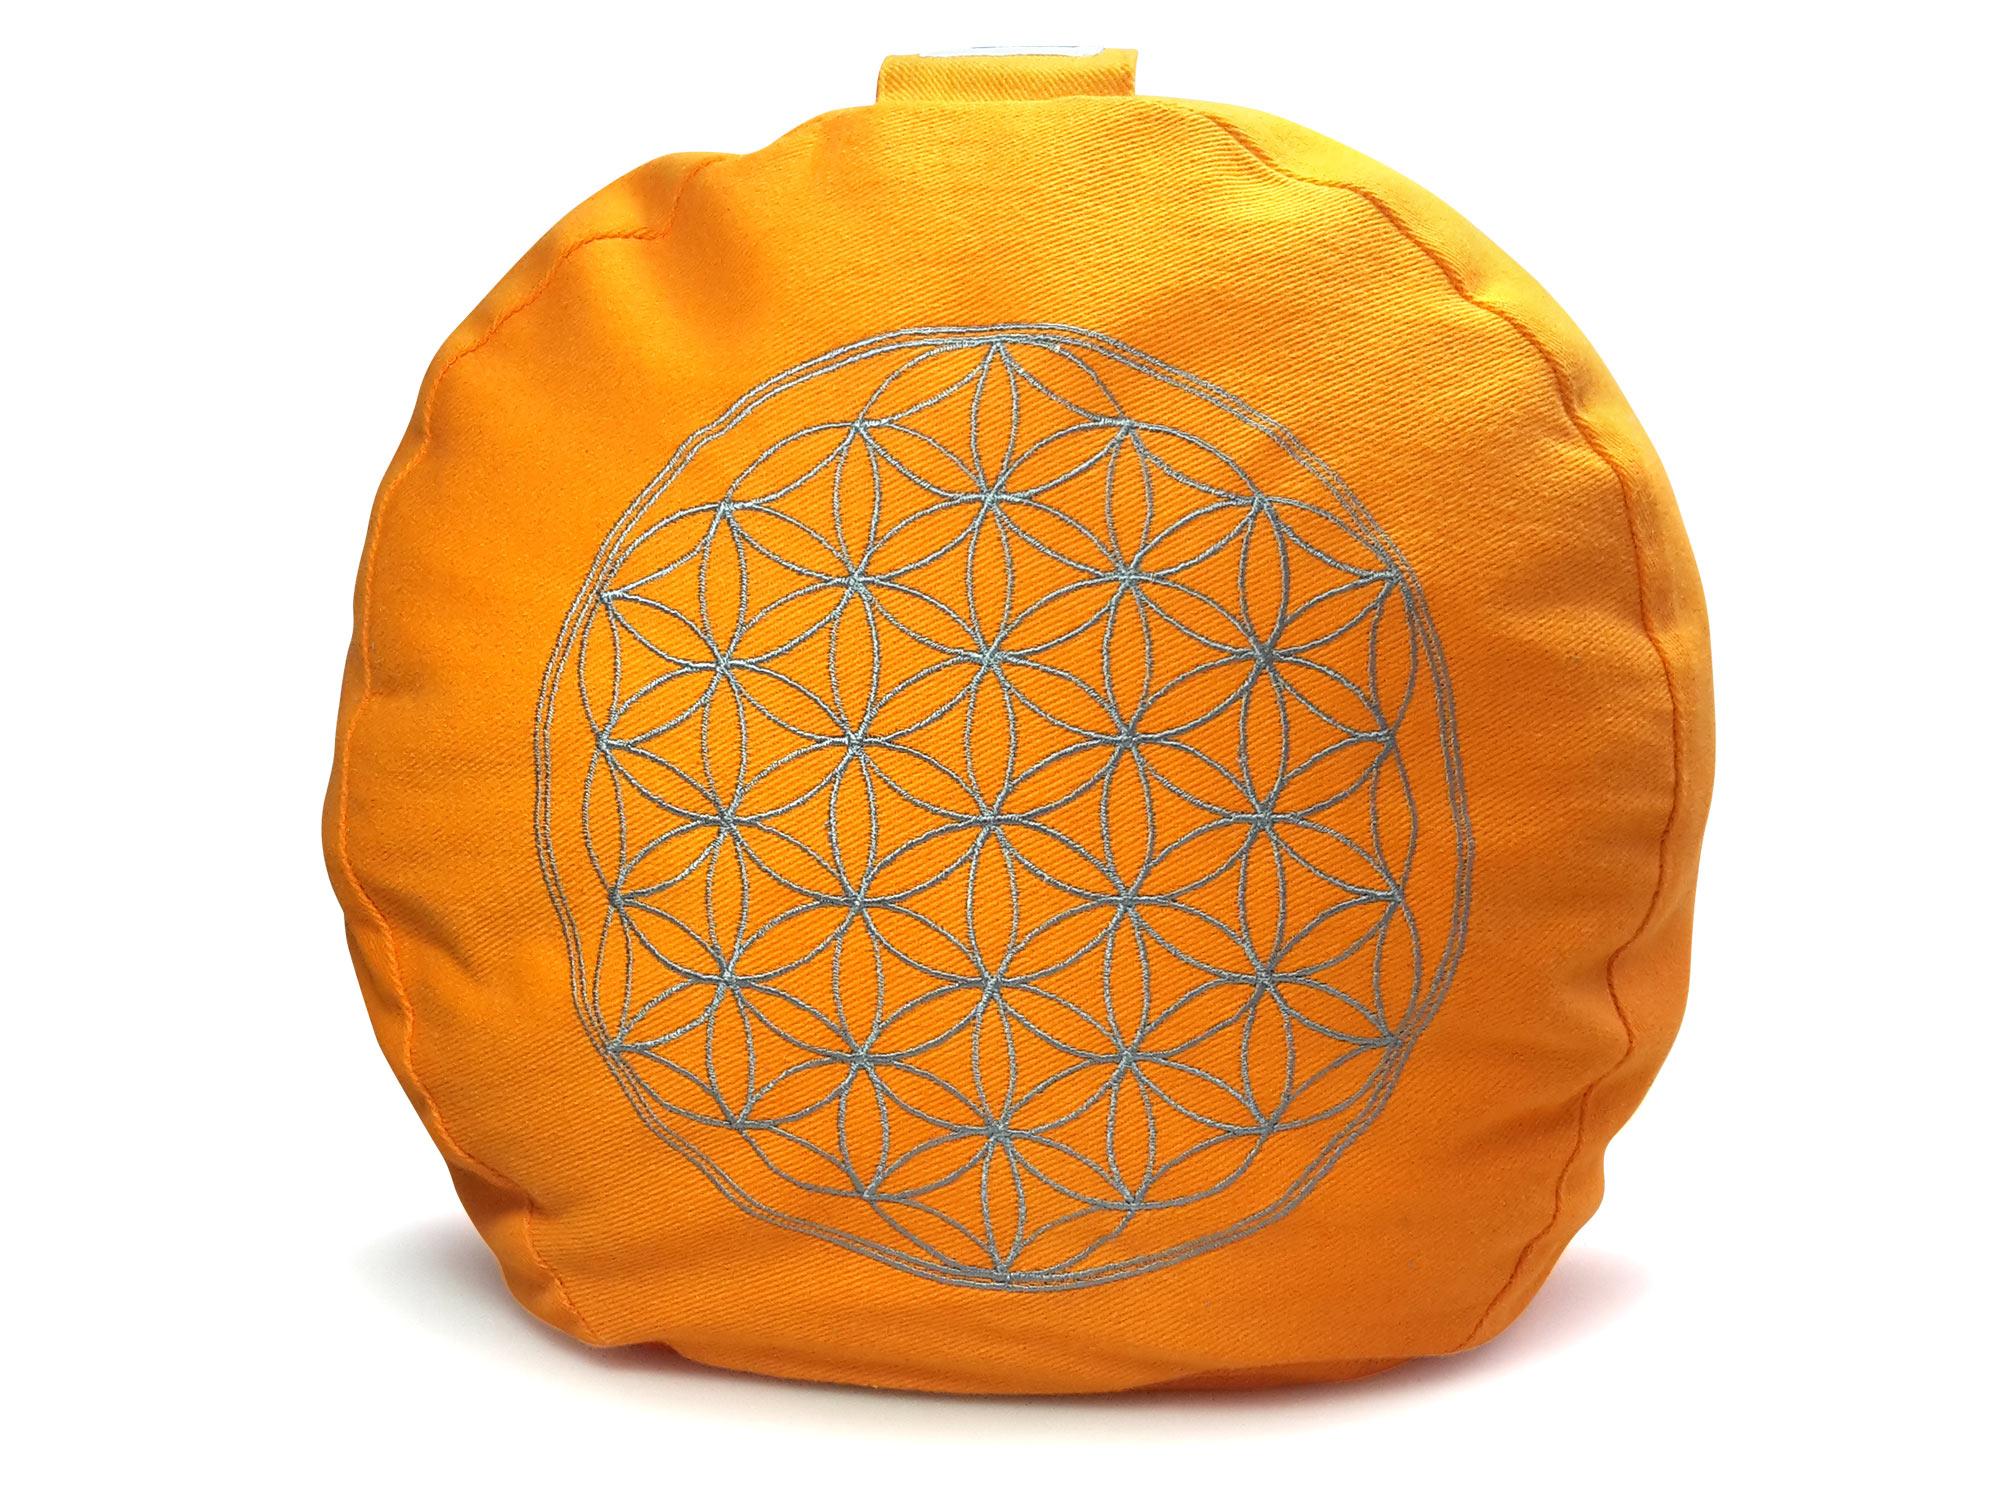 Meditationskissen, Blume des Lebens, orange